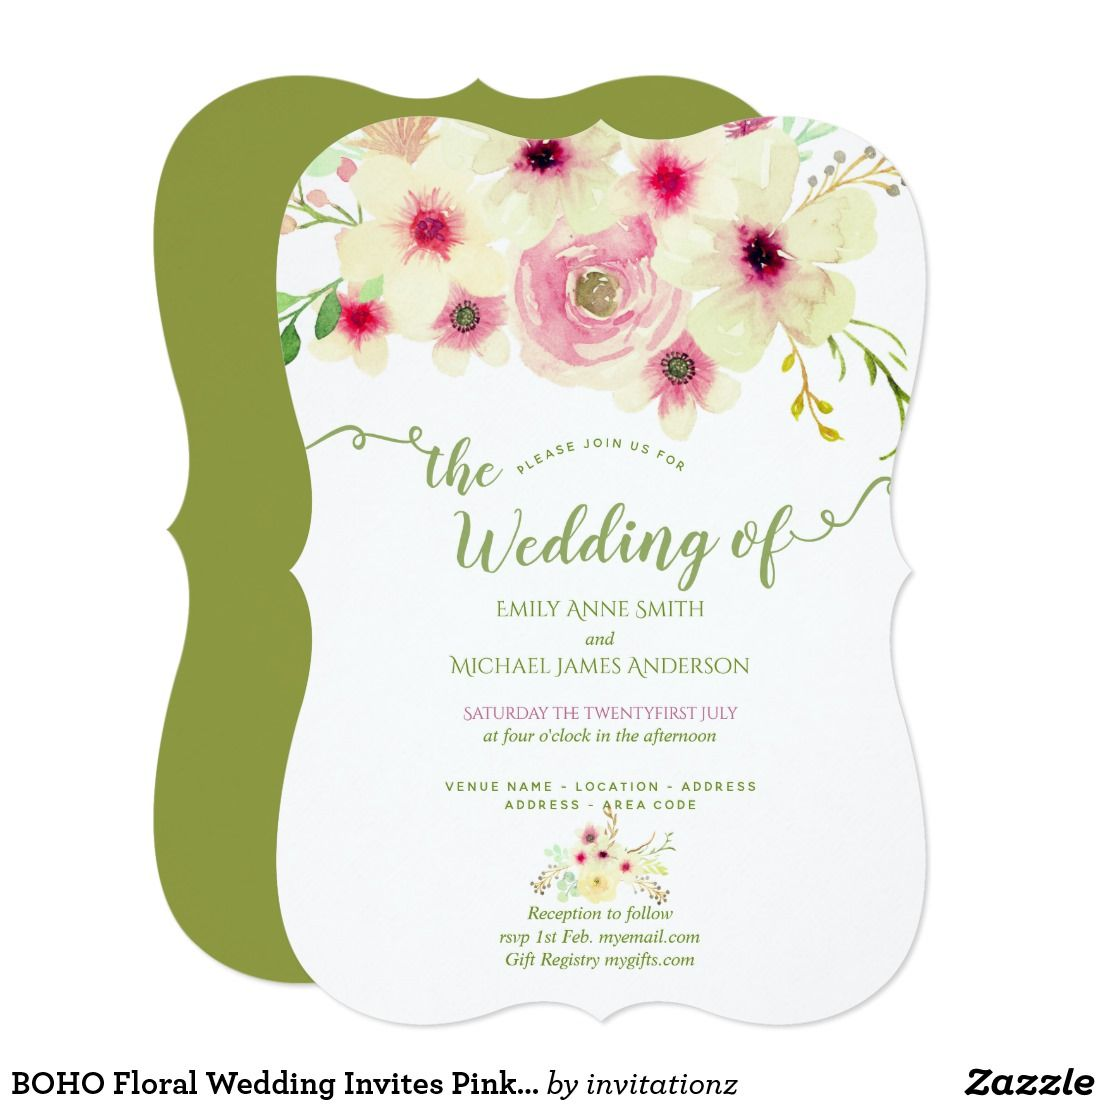 BOHO Floral Wedding Invites Pink Sage Green | Wedding